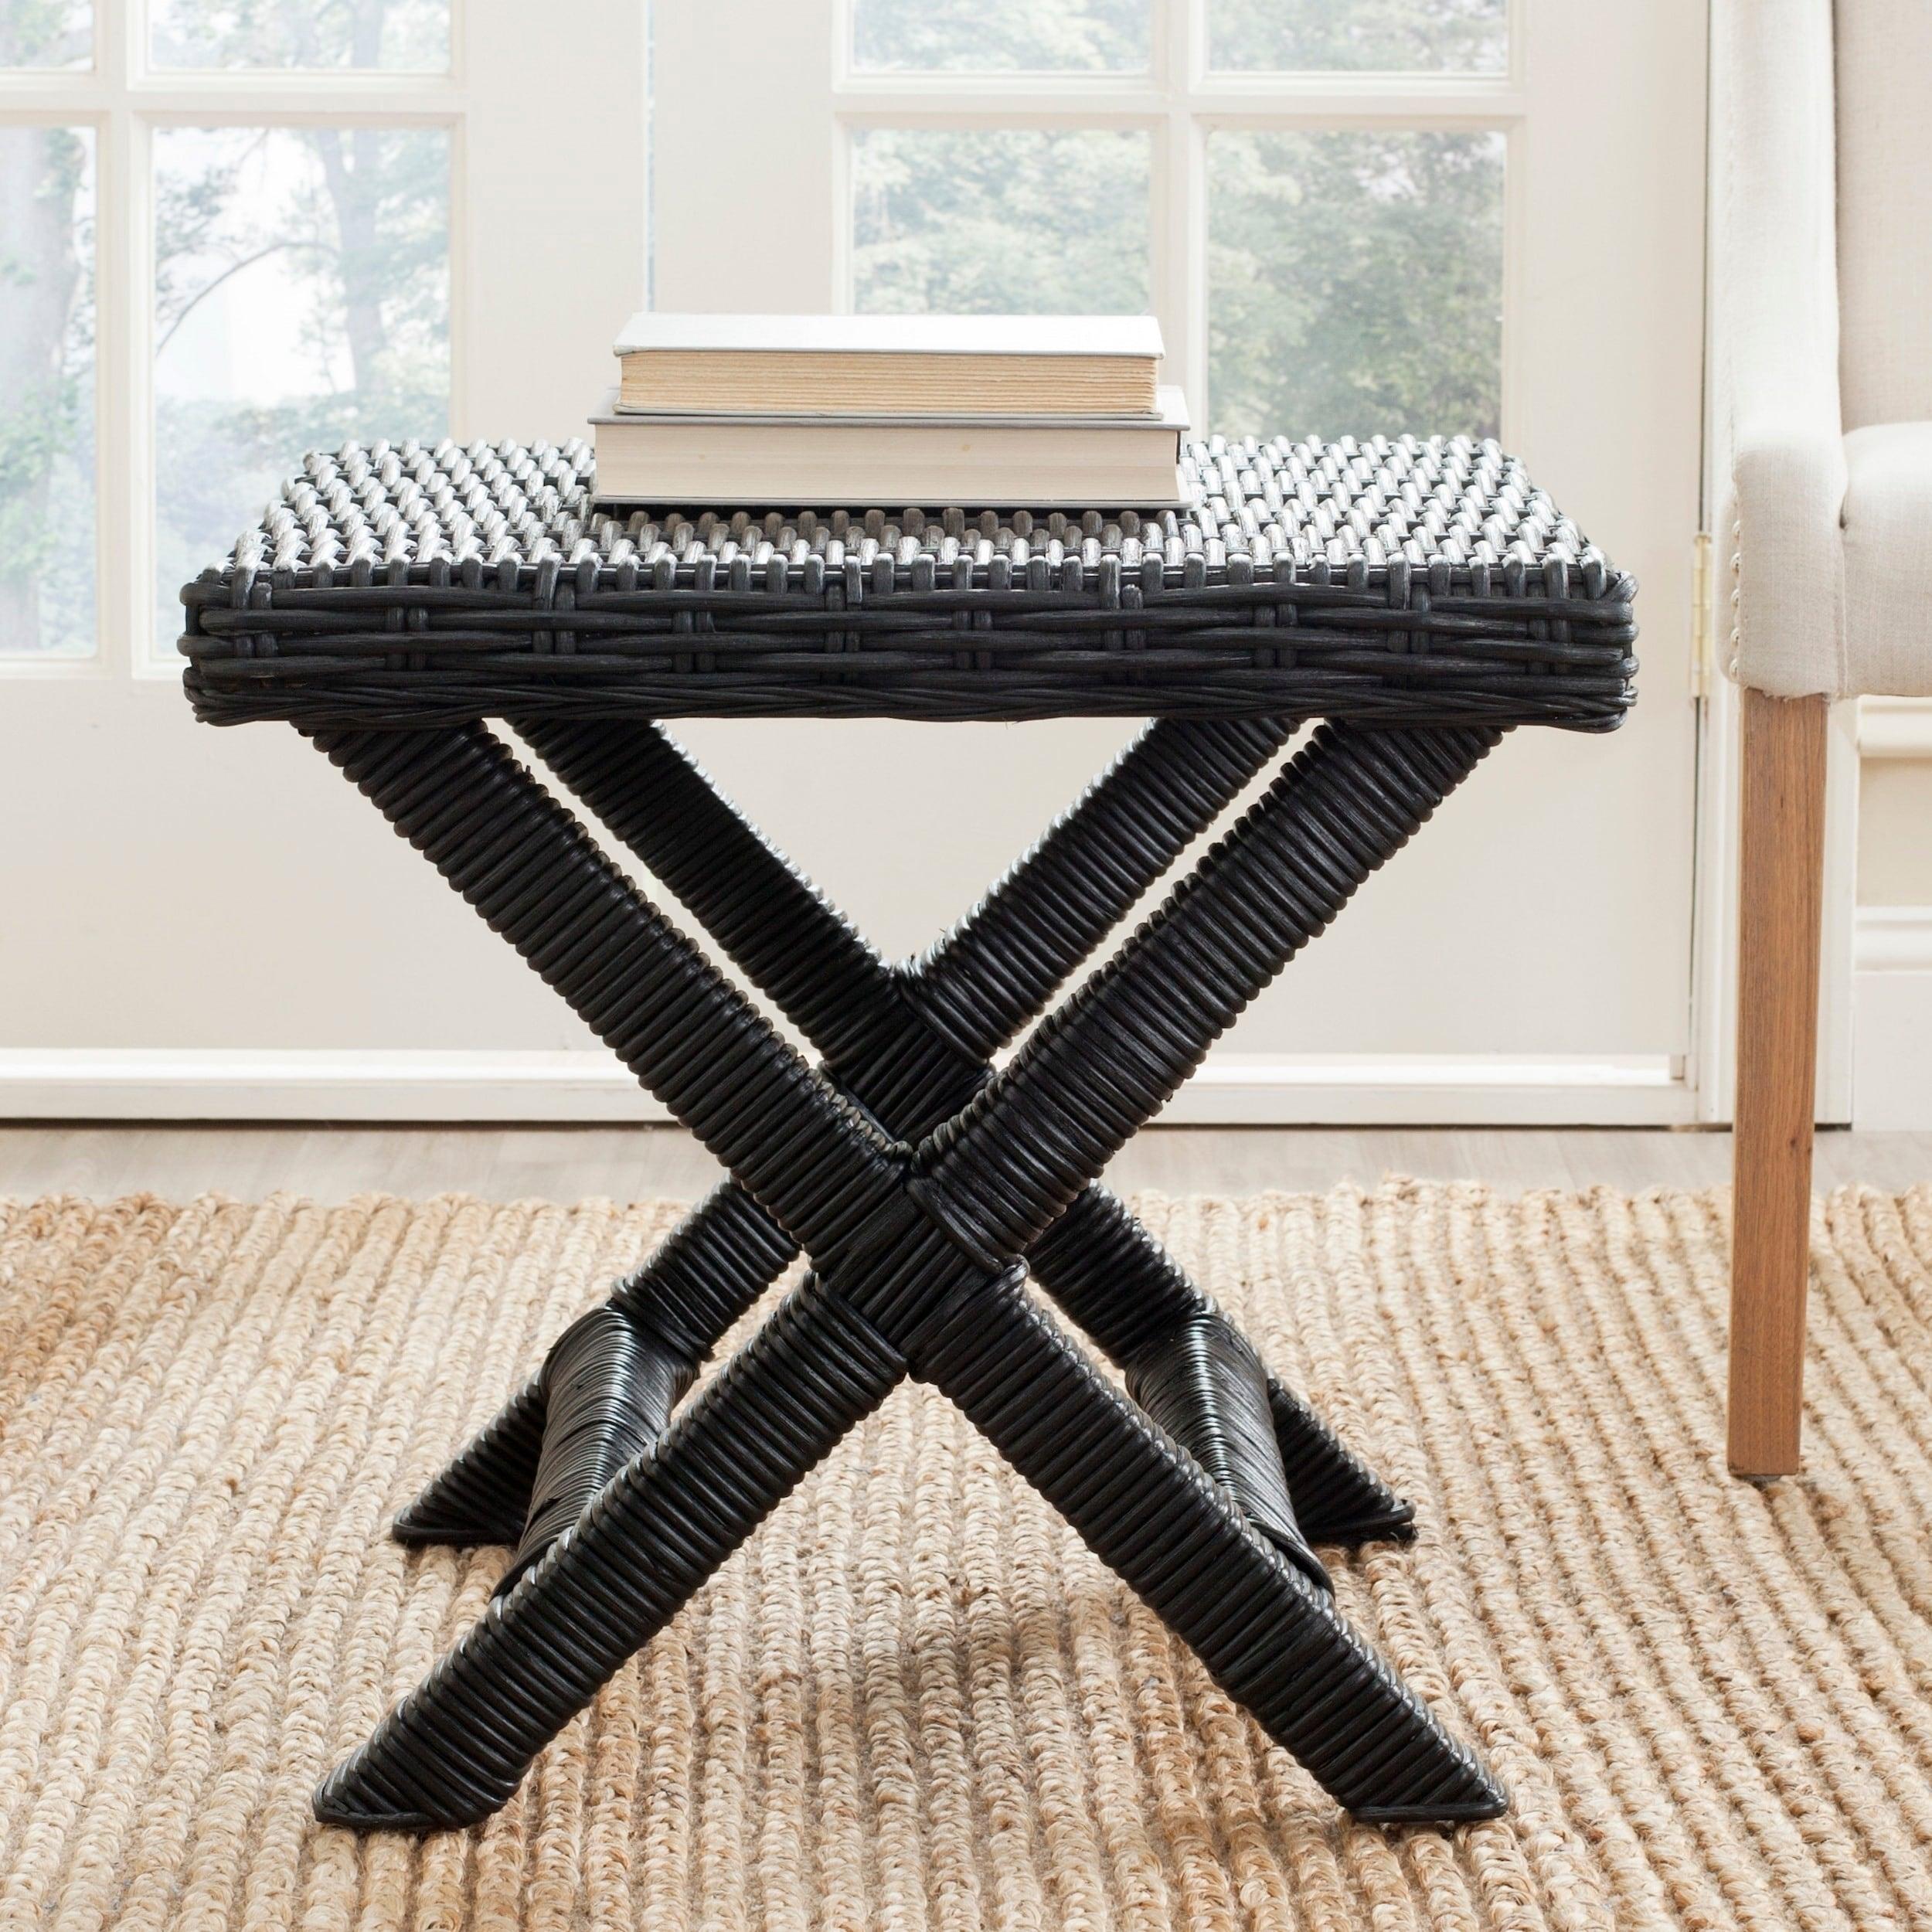 Sectional Sofas Kijiji Kitchener: Garden Furniture Liquidation Sale